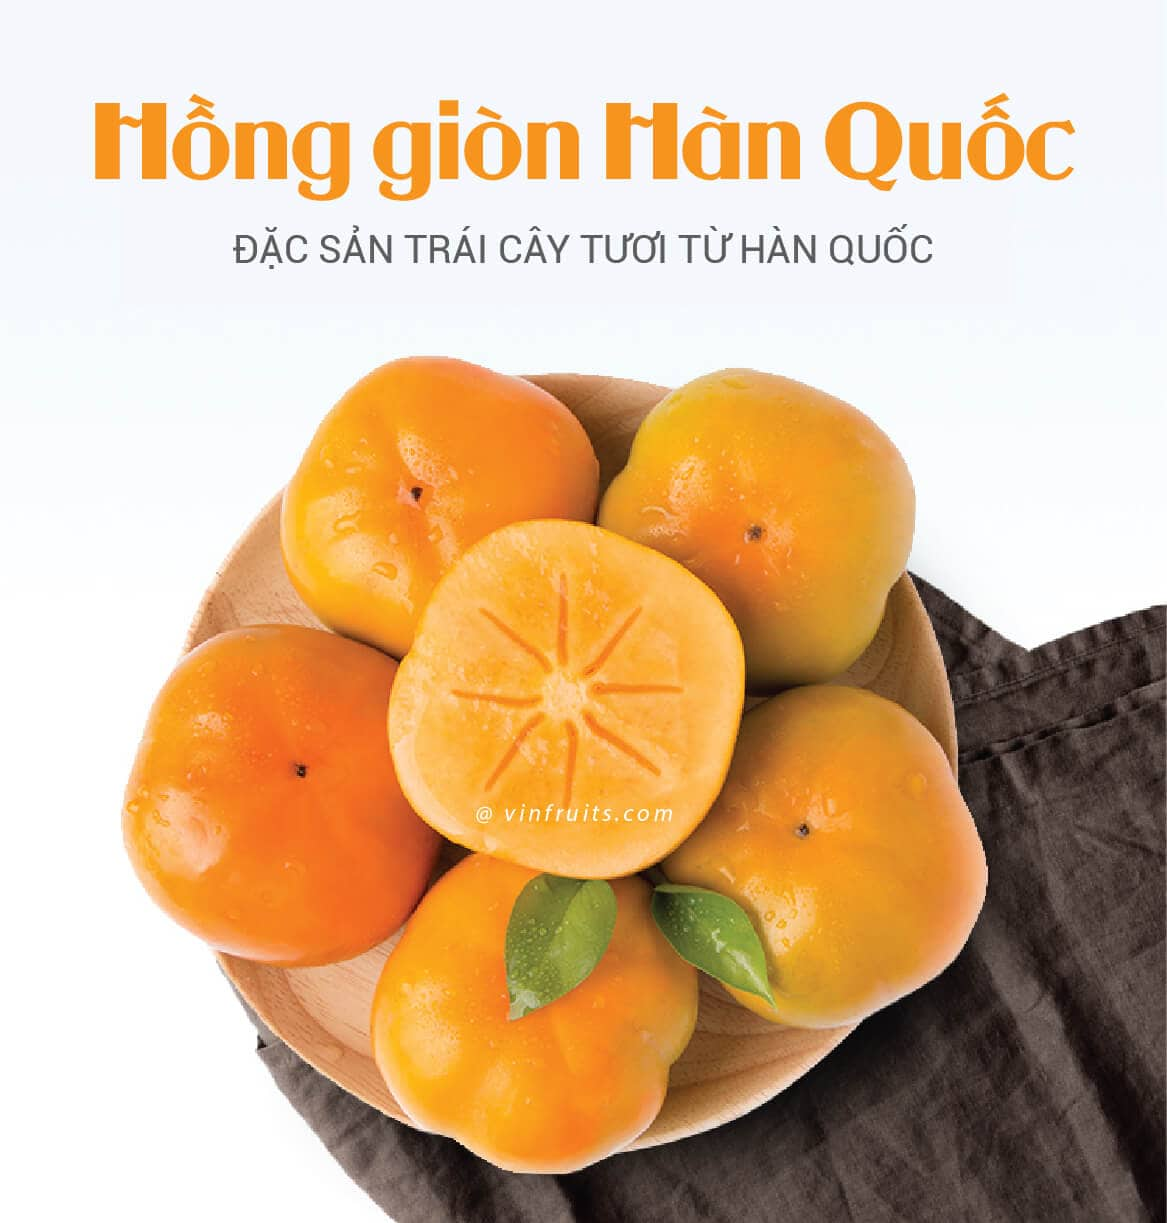 Hong gion Han Quoc - vinfruits 1